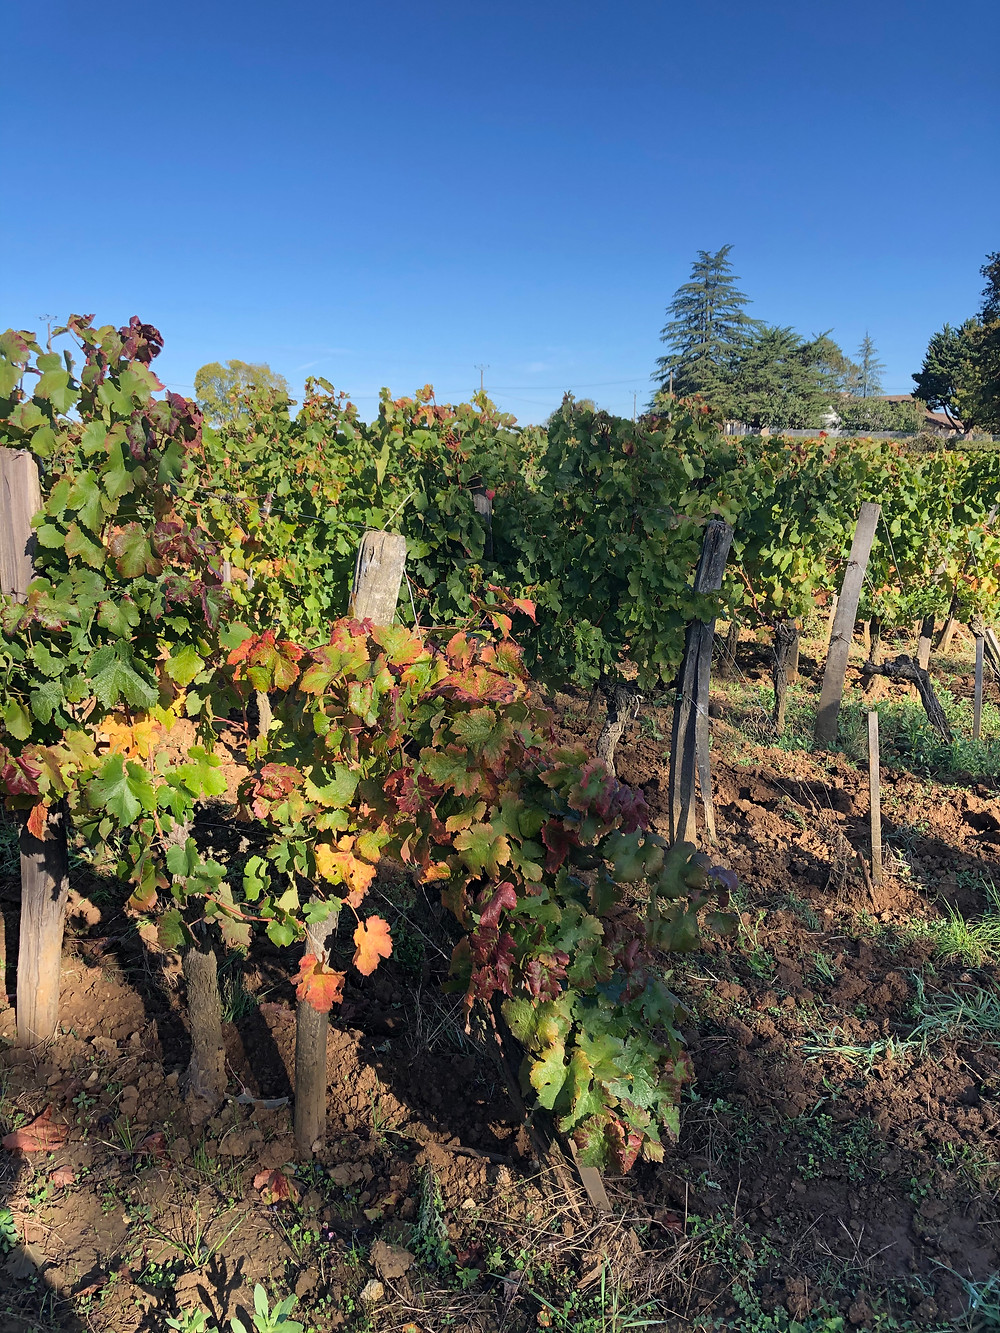 biodynamic vineyards in Bordeaux in Cotes de Francs at Chateau Le Puy biodynamic Bordeaux winery